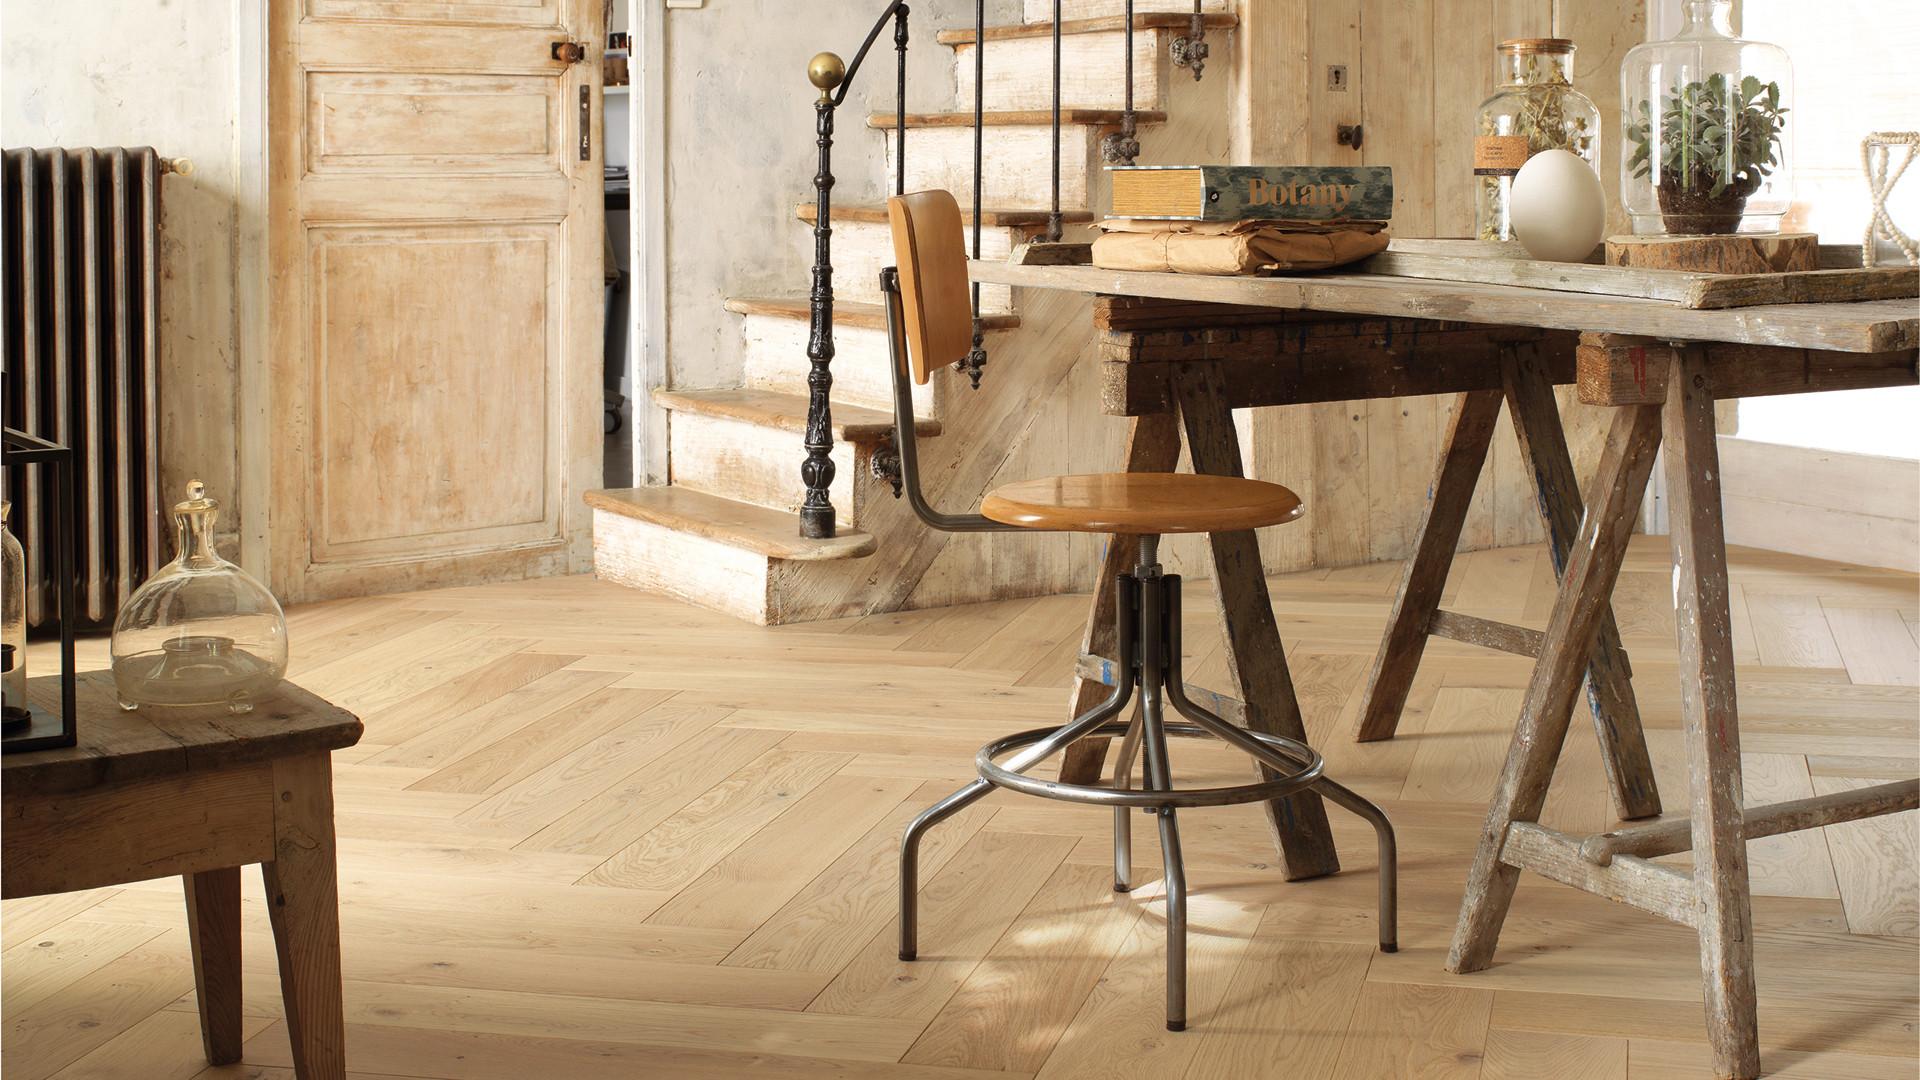 floor french oak authentic bois flott herringbone 139. Black Bedroom Furniture Sets. Home Design Ideas